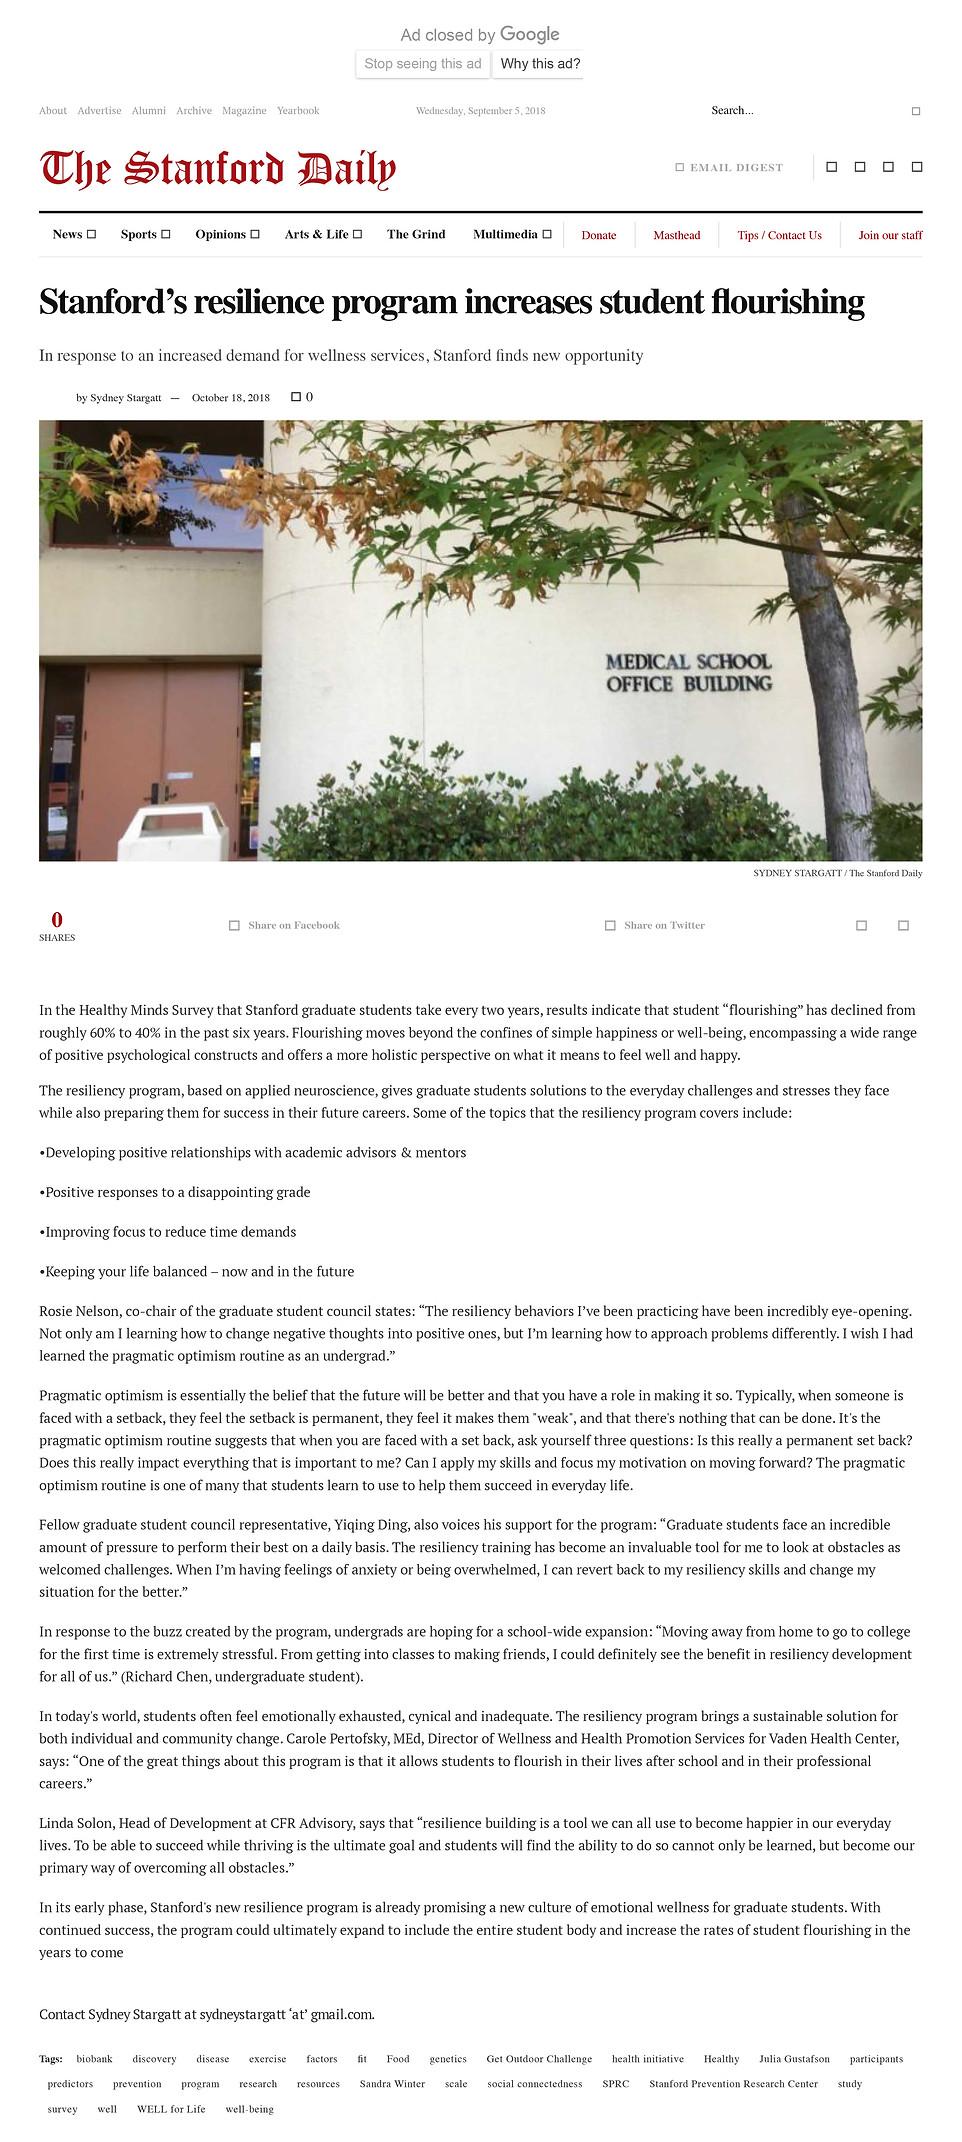 Stanford-Daily-Post1.jpg